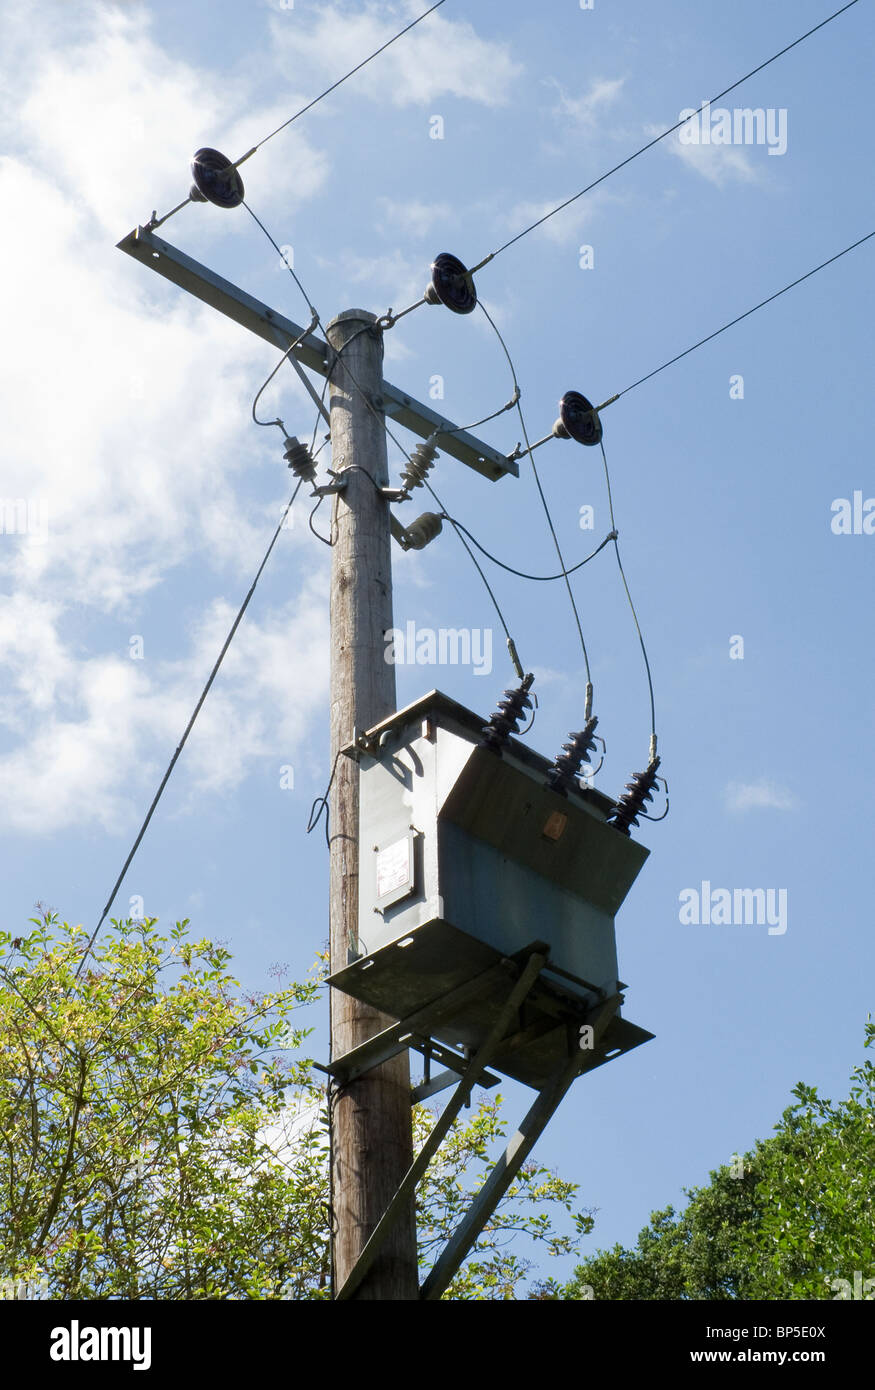 Three Phase Electric Power Stock Photos & Three Phase Electric Power ...